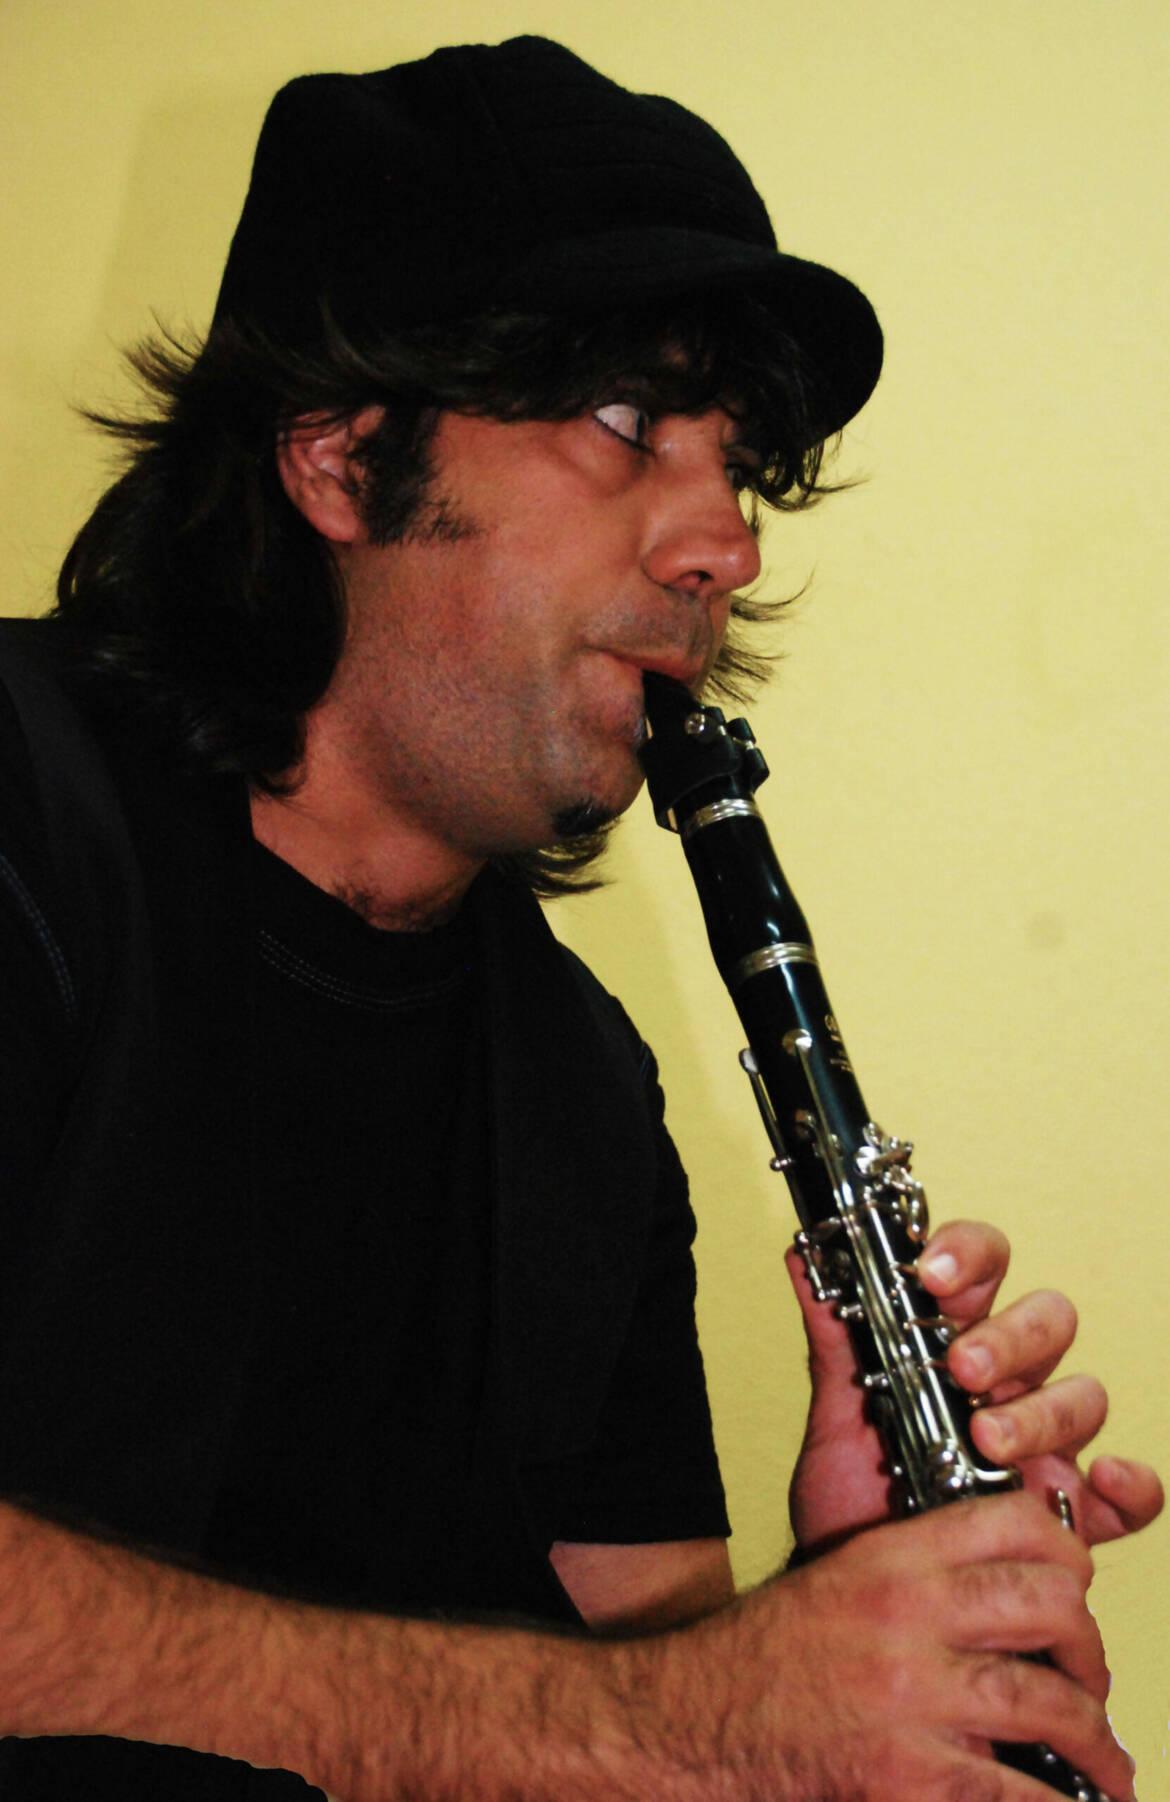 jraya_clarinet1-scaled.jpg